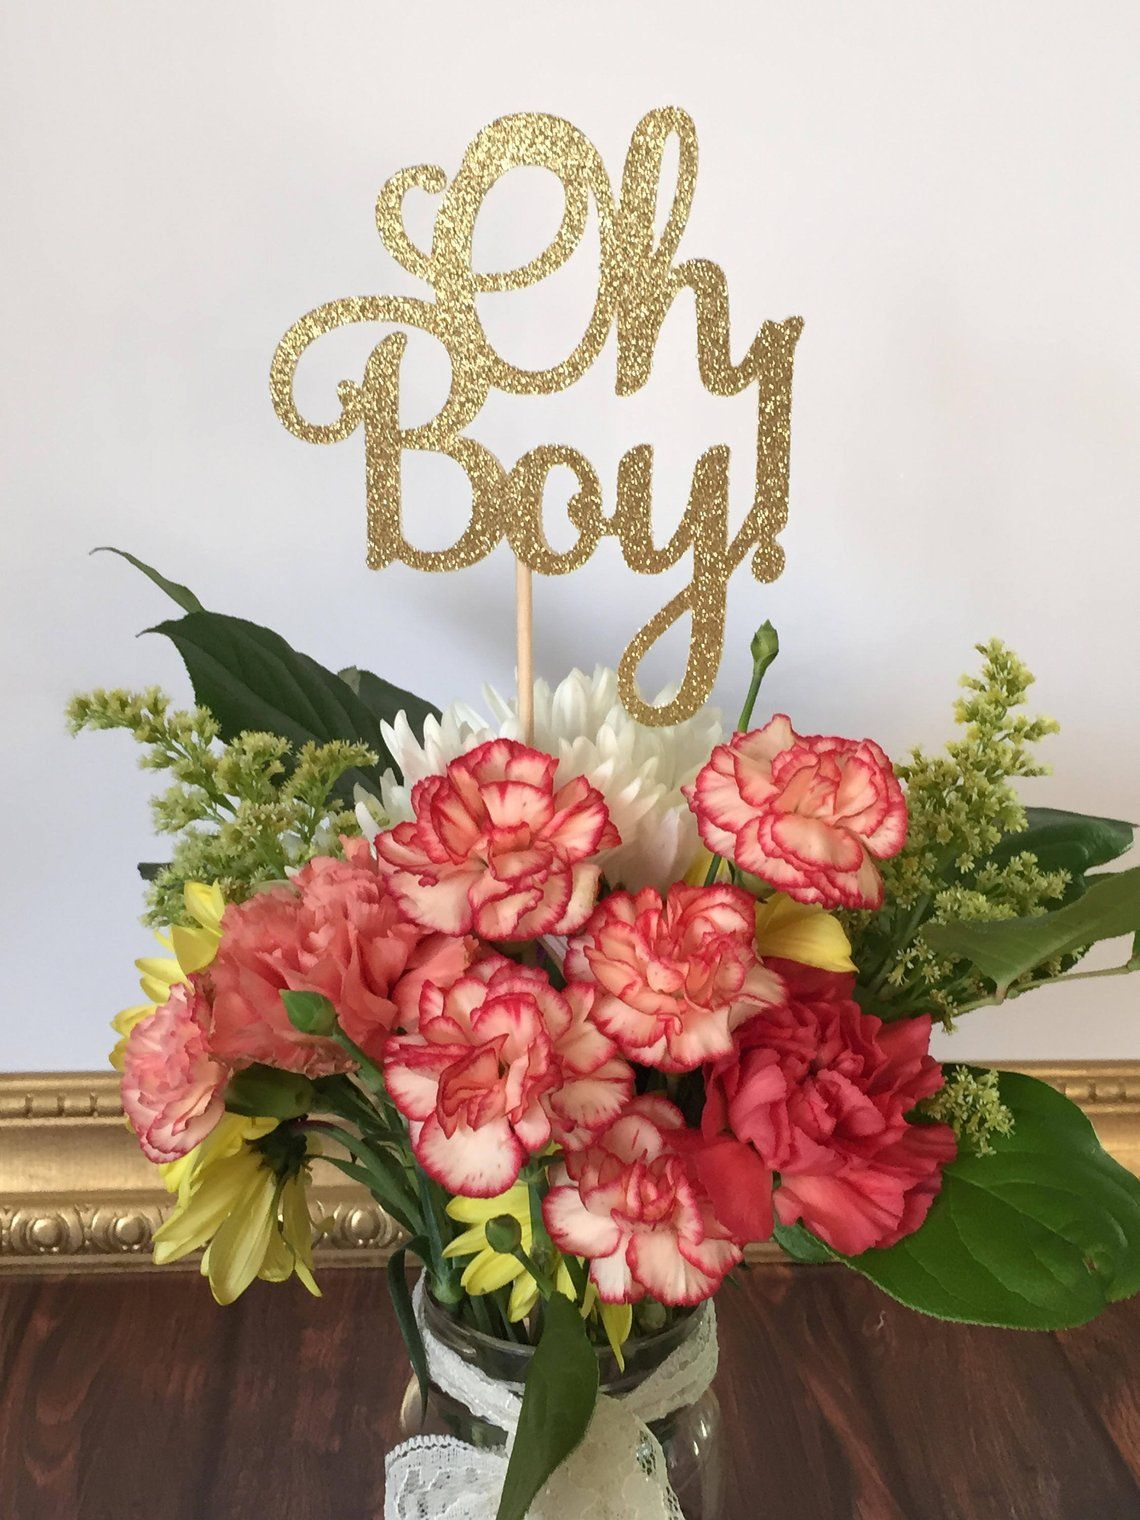 Oh Boy Centerpiece Sticks Baby Boy Table Decorations Baby Etsy Boy Baby Shower Centerpieces Baby Shower Centerpieces Baby Boy Decorations